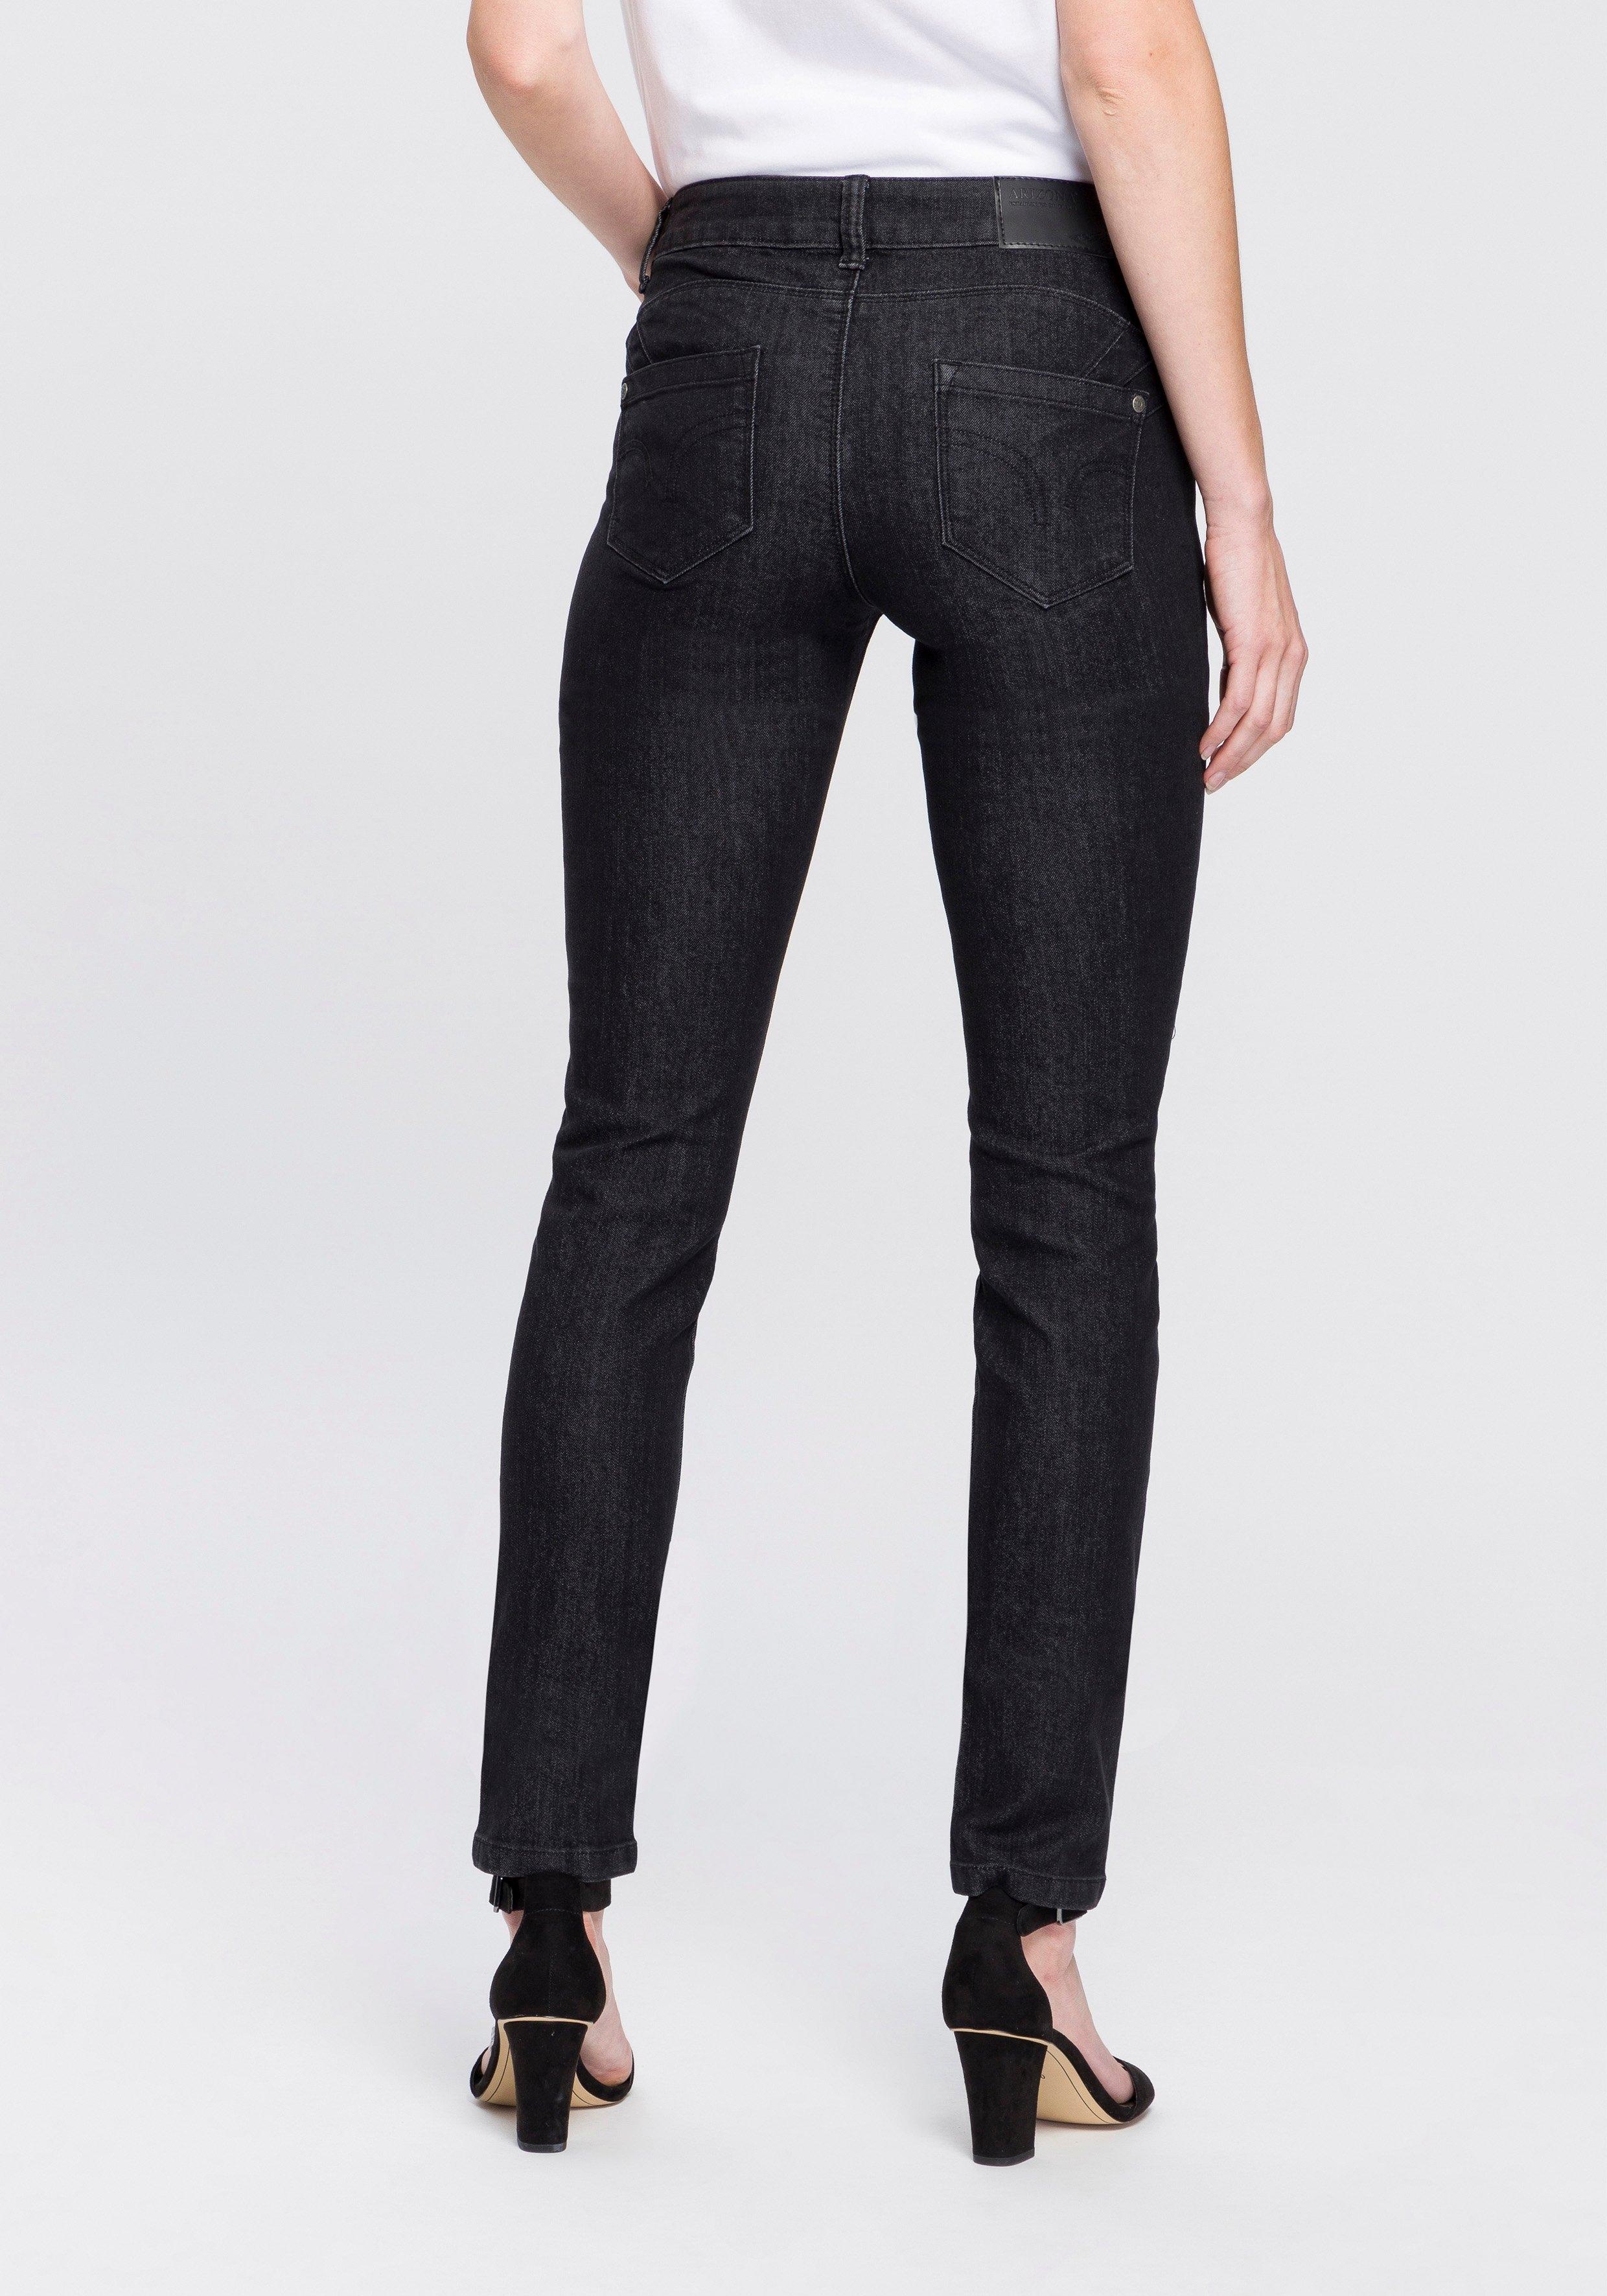 Arizona Skinny fit jeans Shaping Mid waist bestellen: 30 dagen bedenktijd